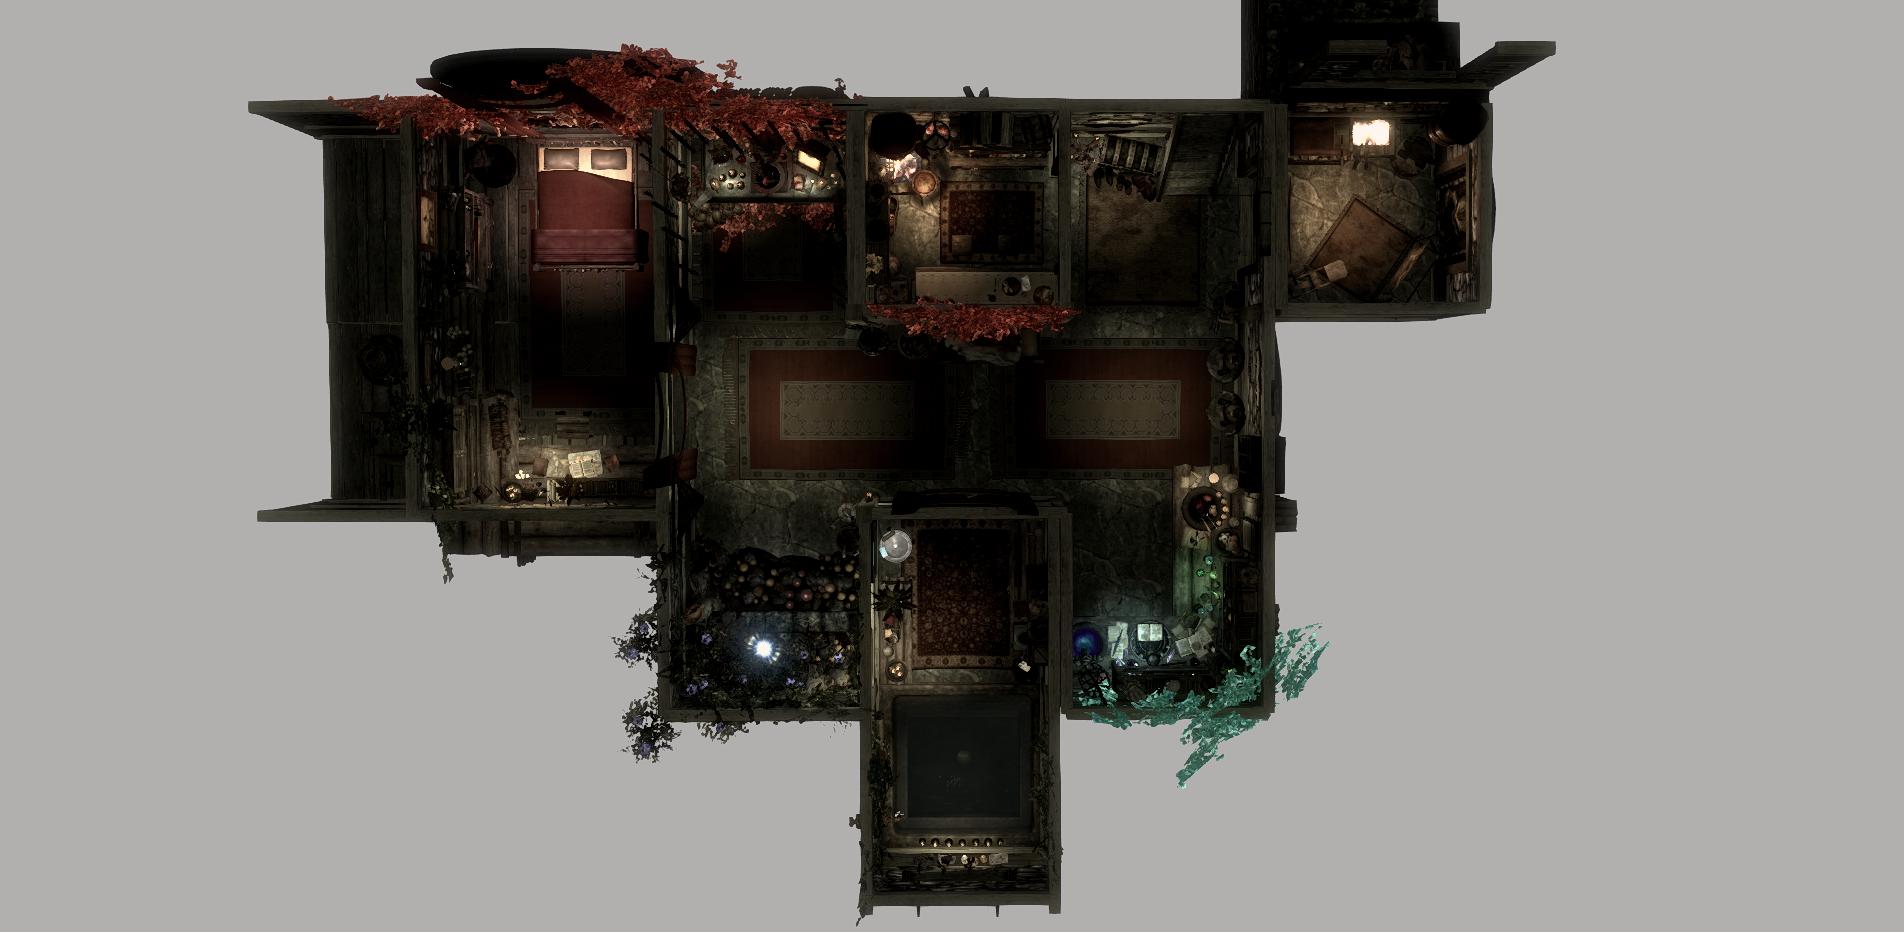 Sicarius' Refuge - A Hitman's Hideout - Assassin Home by